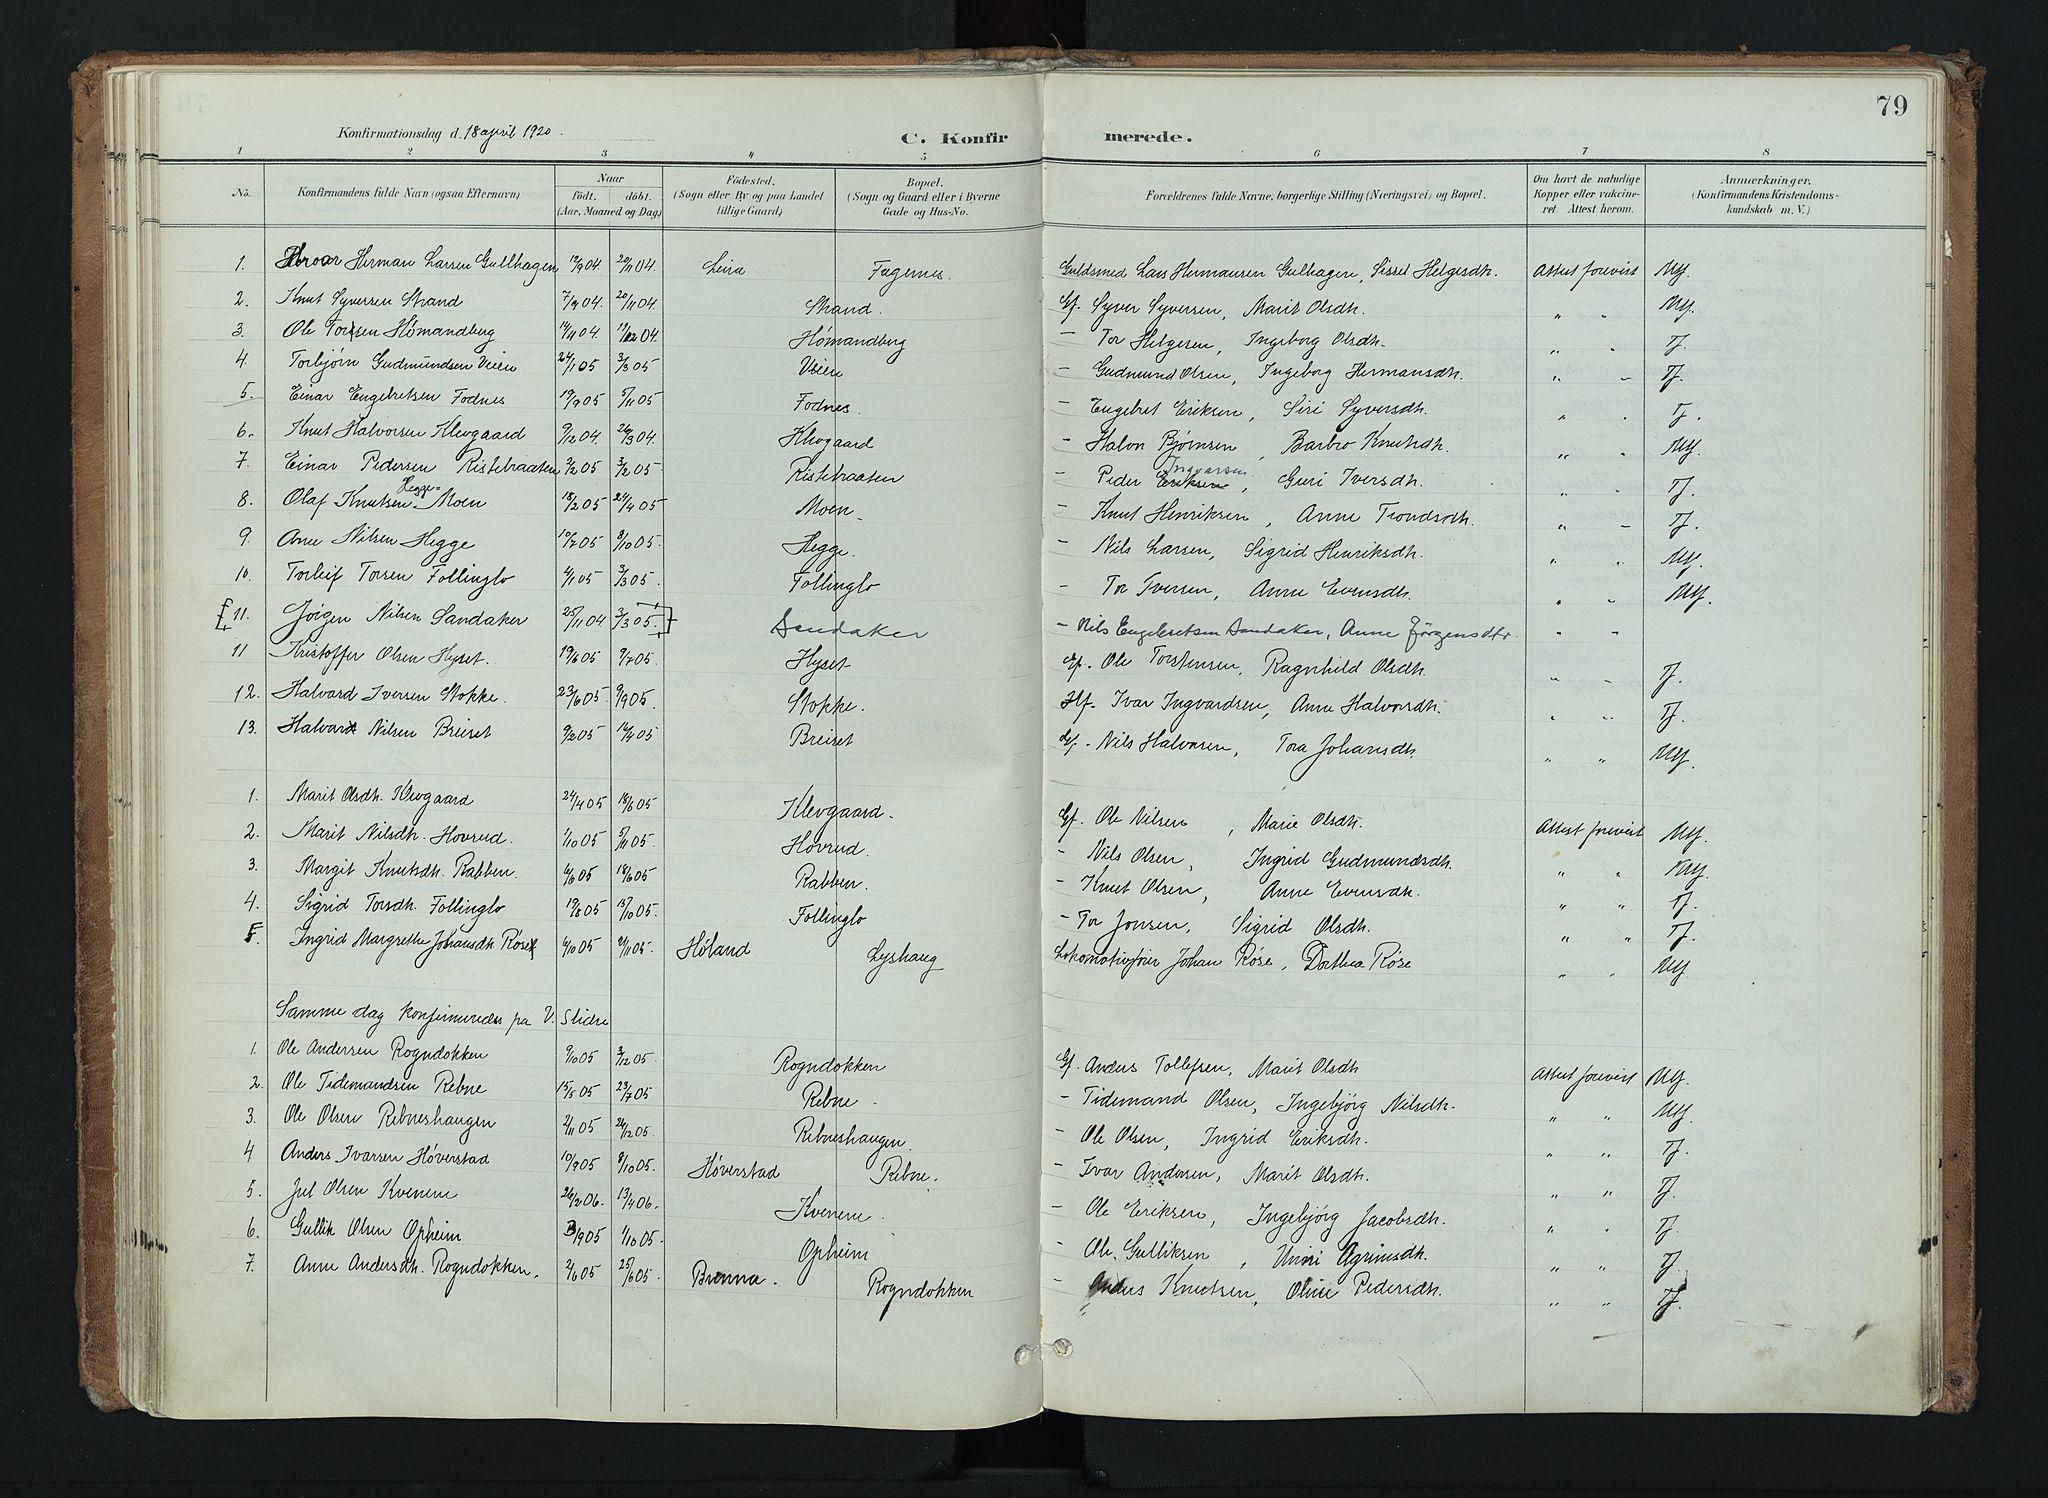 SAH, Nord-Aurdal prestekontor, Ministerialbok nr. 16, 1897-1925, s. 79